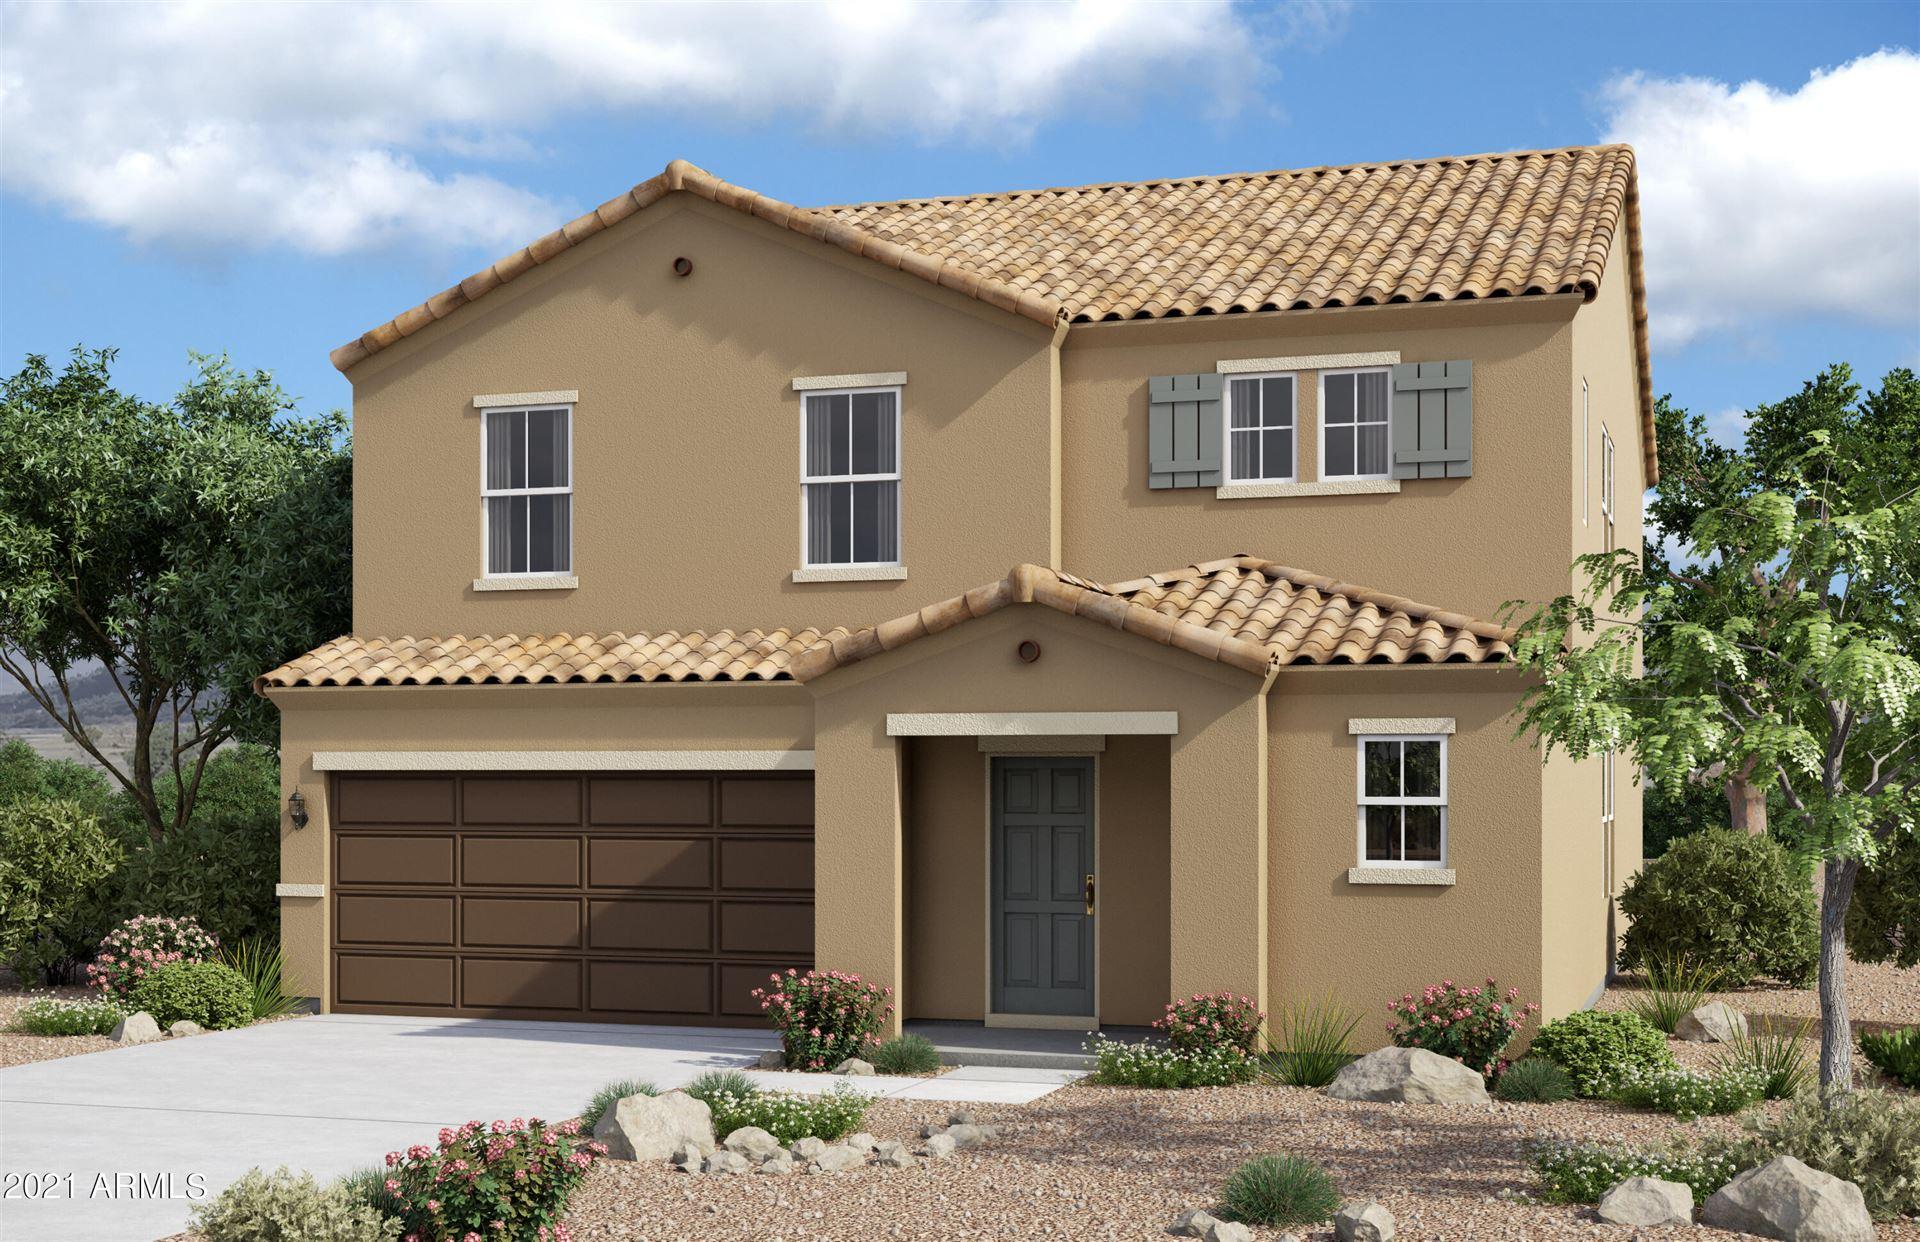 Photo of 12575 W MIDWAY Avenue, Glendale, AZ 85307 (MLS # 6296549)